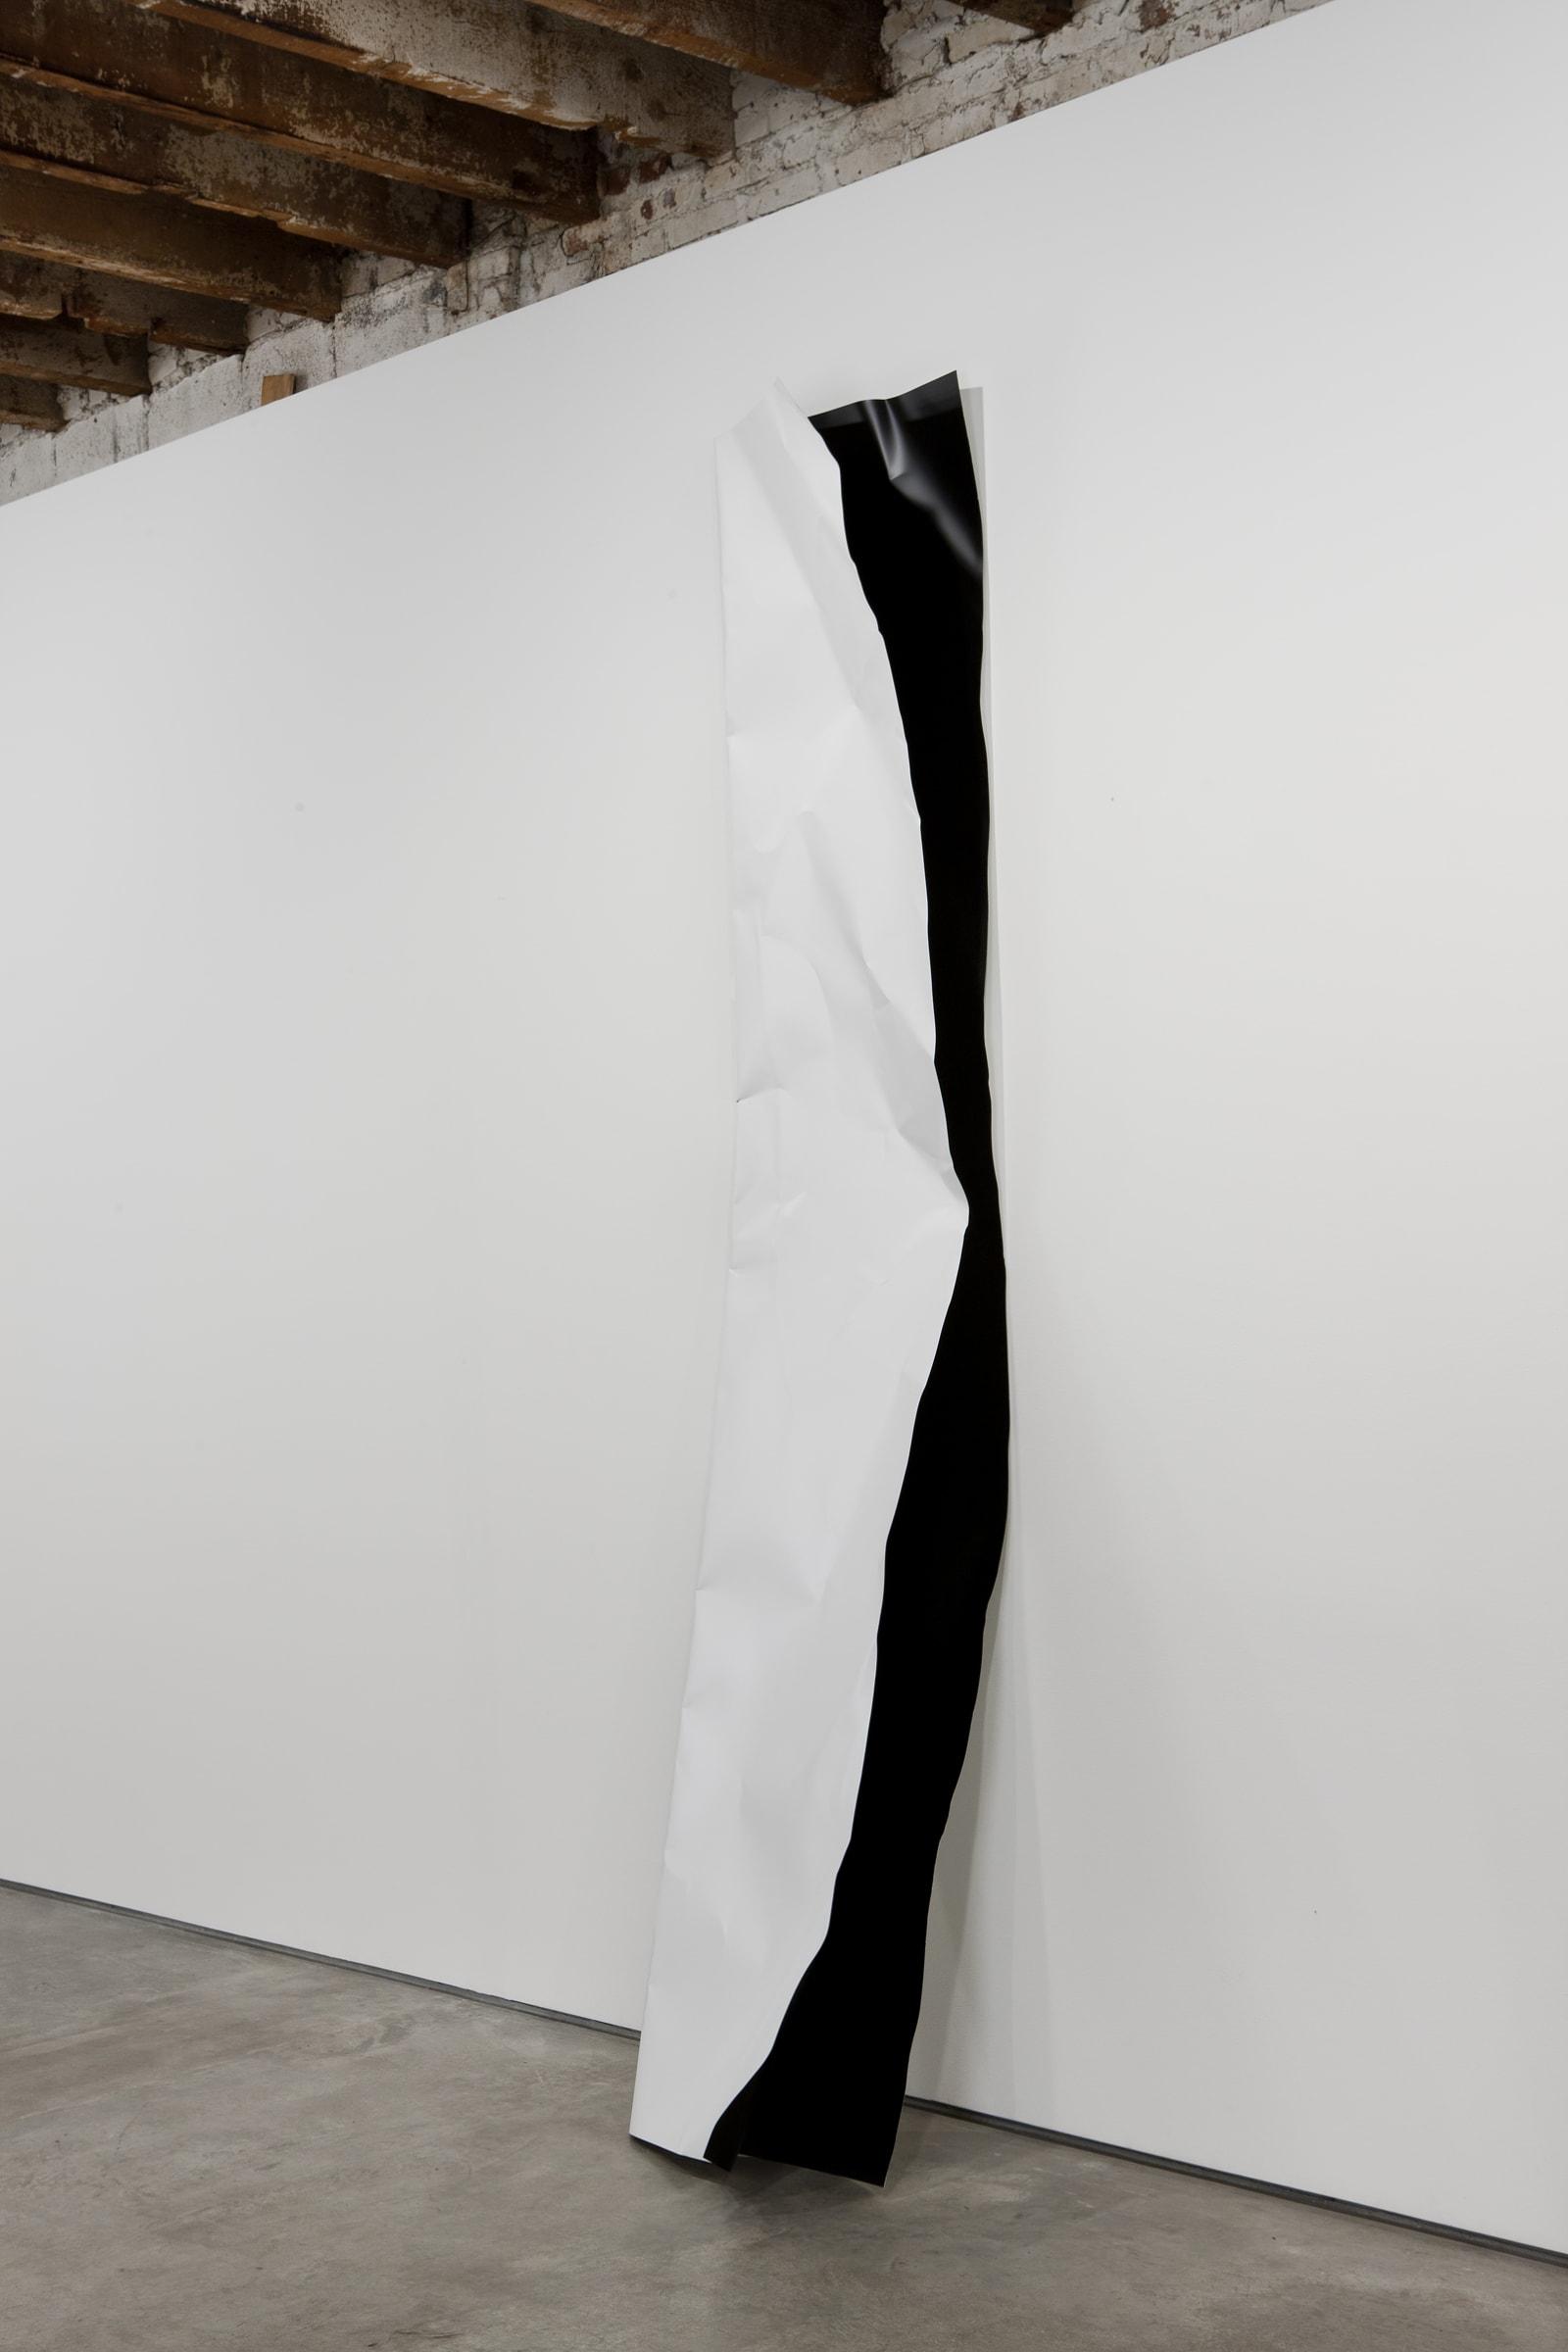 "<span class=""link fancybox-details-link""><a href=""/exhibitions/166/works/artworks15354/"">View Detail Page</a></span><div class=""artist""><strong>Michelle Lopez</strong></div><div class=""title""><em>Blue Angel I</em>, 2011</div><div class=""medium"">aluminum and powder-coated aluminum</div><div class=""dimensions"">304.8 x 61 x 30.5 cm<br>120 x 24 x 12 in</div>"